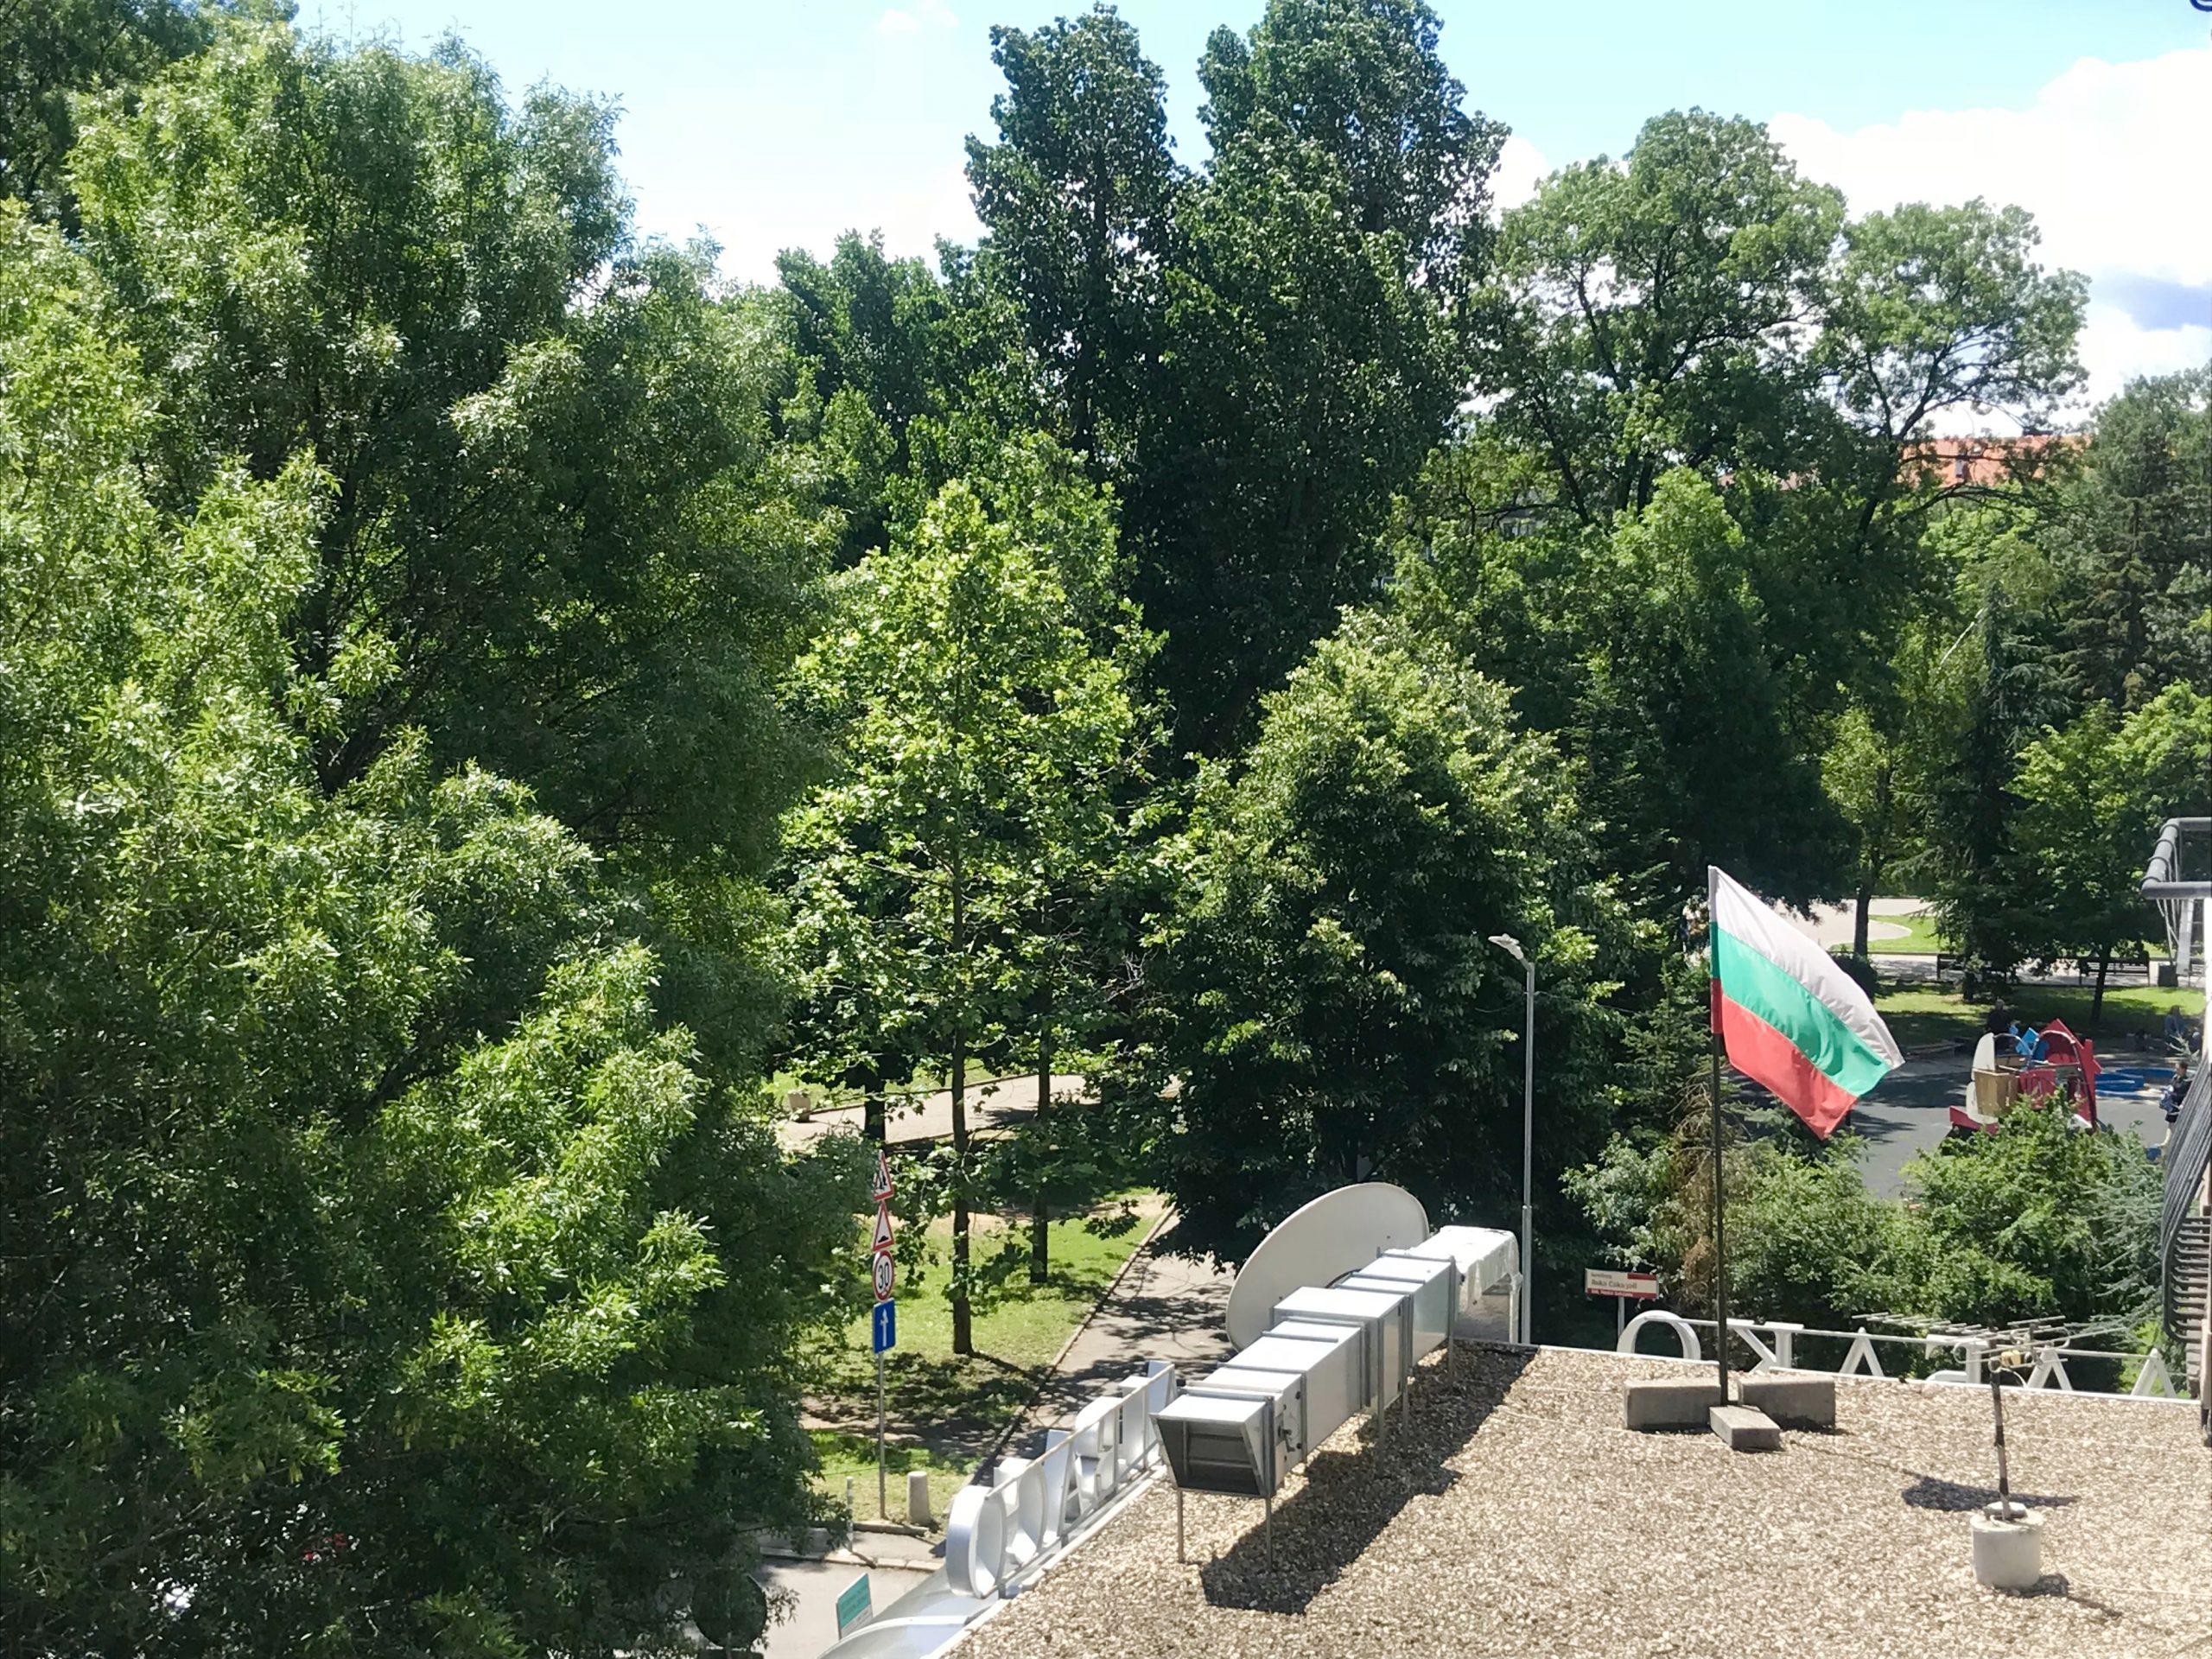 Тристаен апартамент подходящ за офис, до Парк Заимов, гр. София